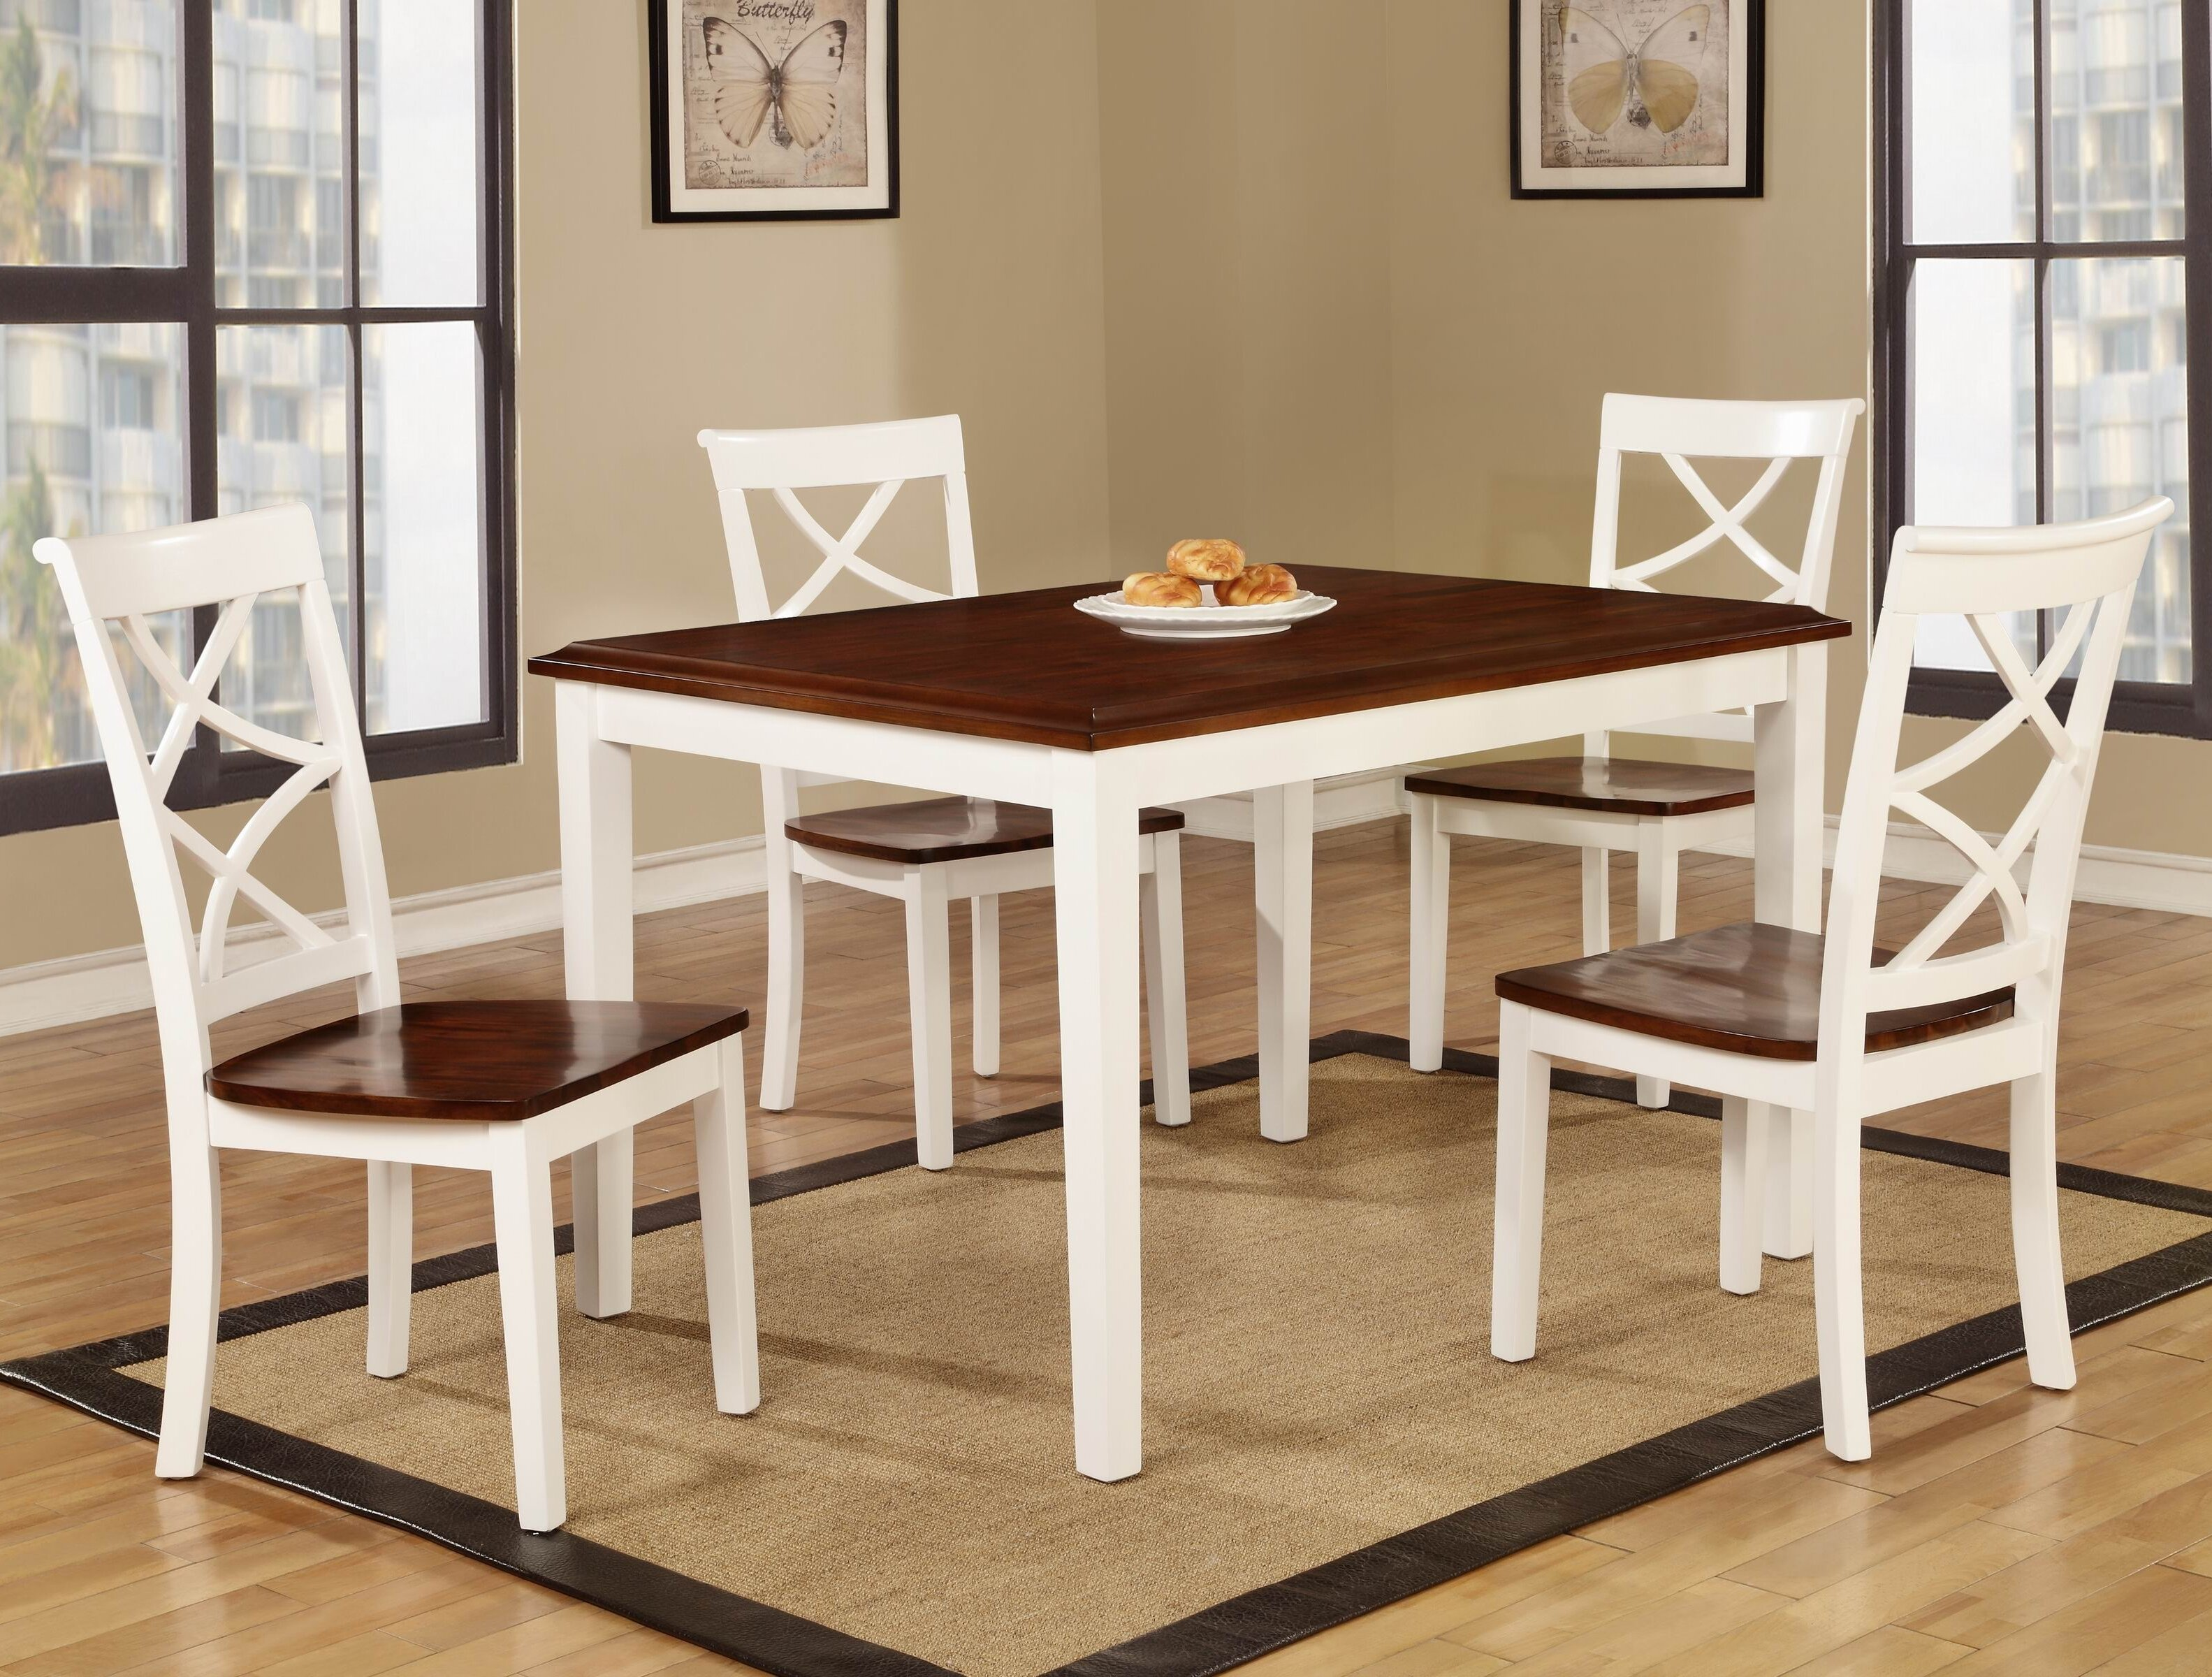 Roundhill Furniture Baum Two Tone Solid Wood 5 Piece Dining Set U0026 Reviews |  Wayfair